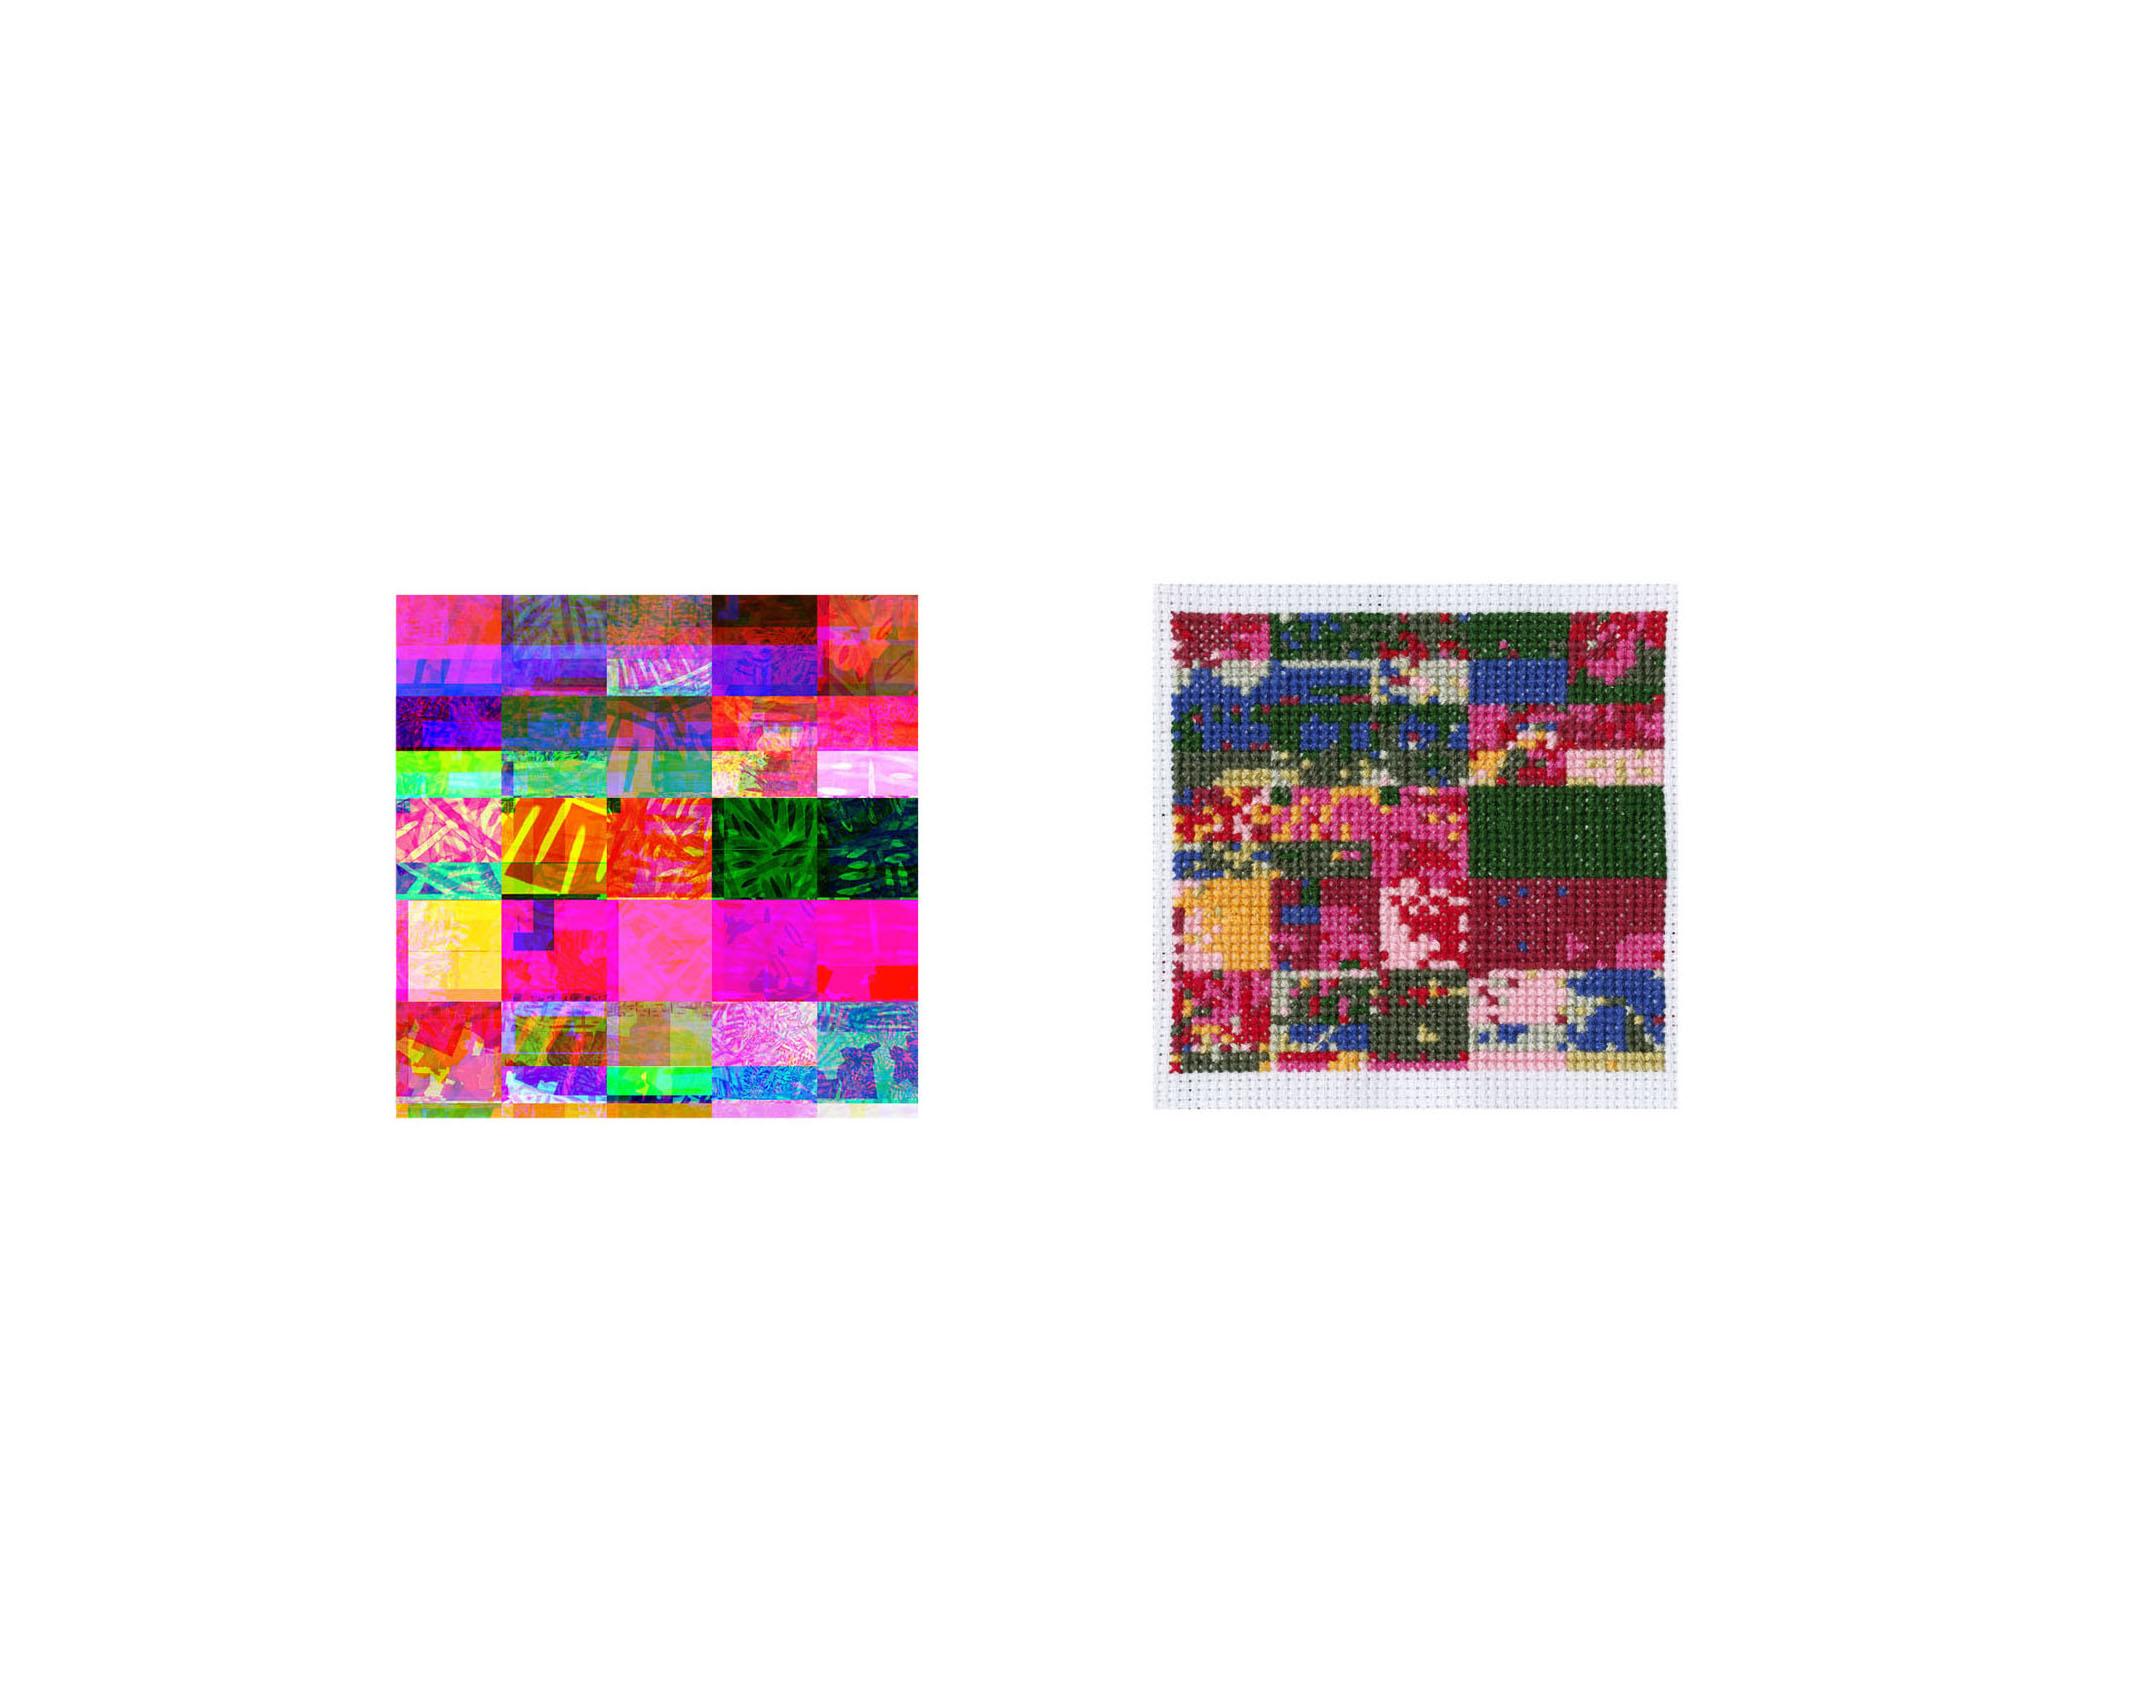 Glitch Series 01 - Crop_4.jpg